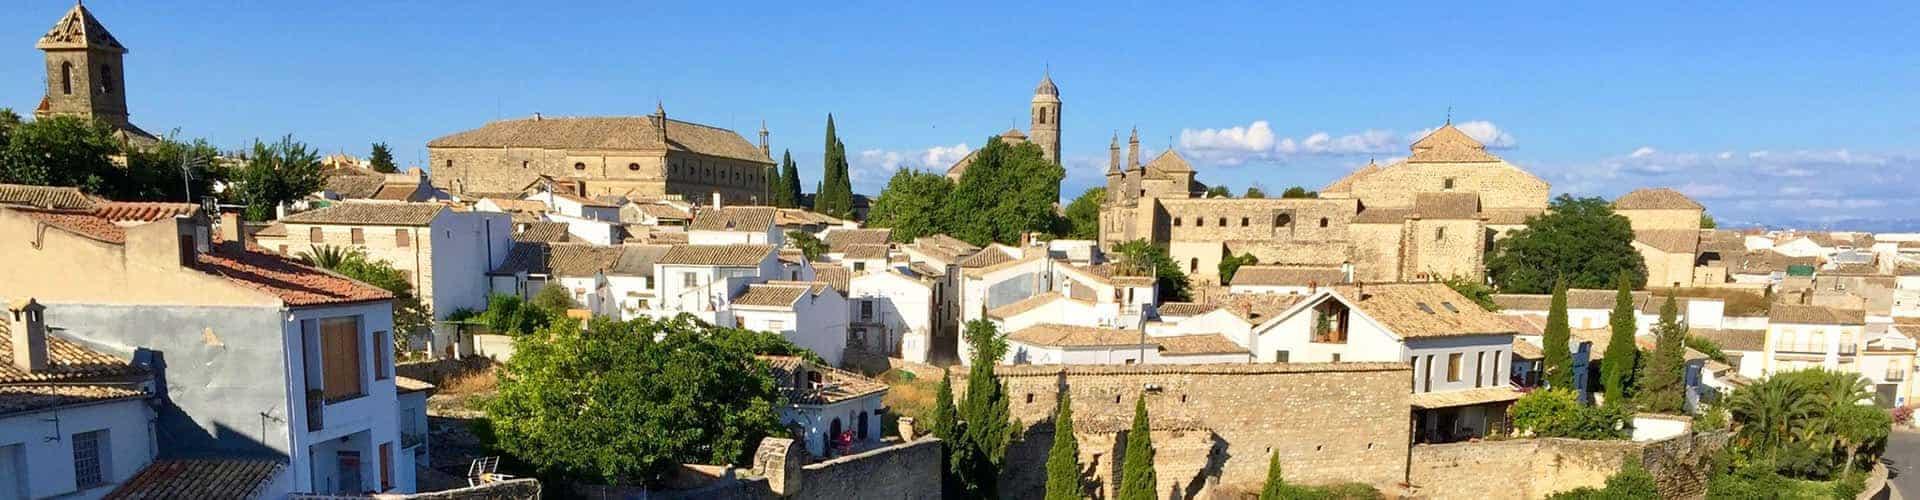 Free Tour Baeza - Turismo de España